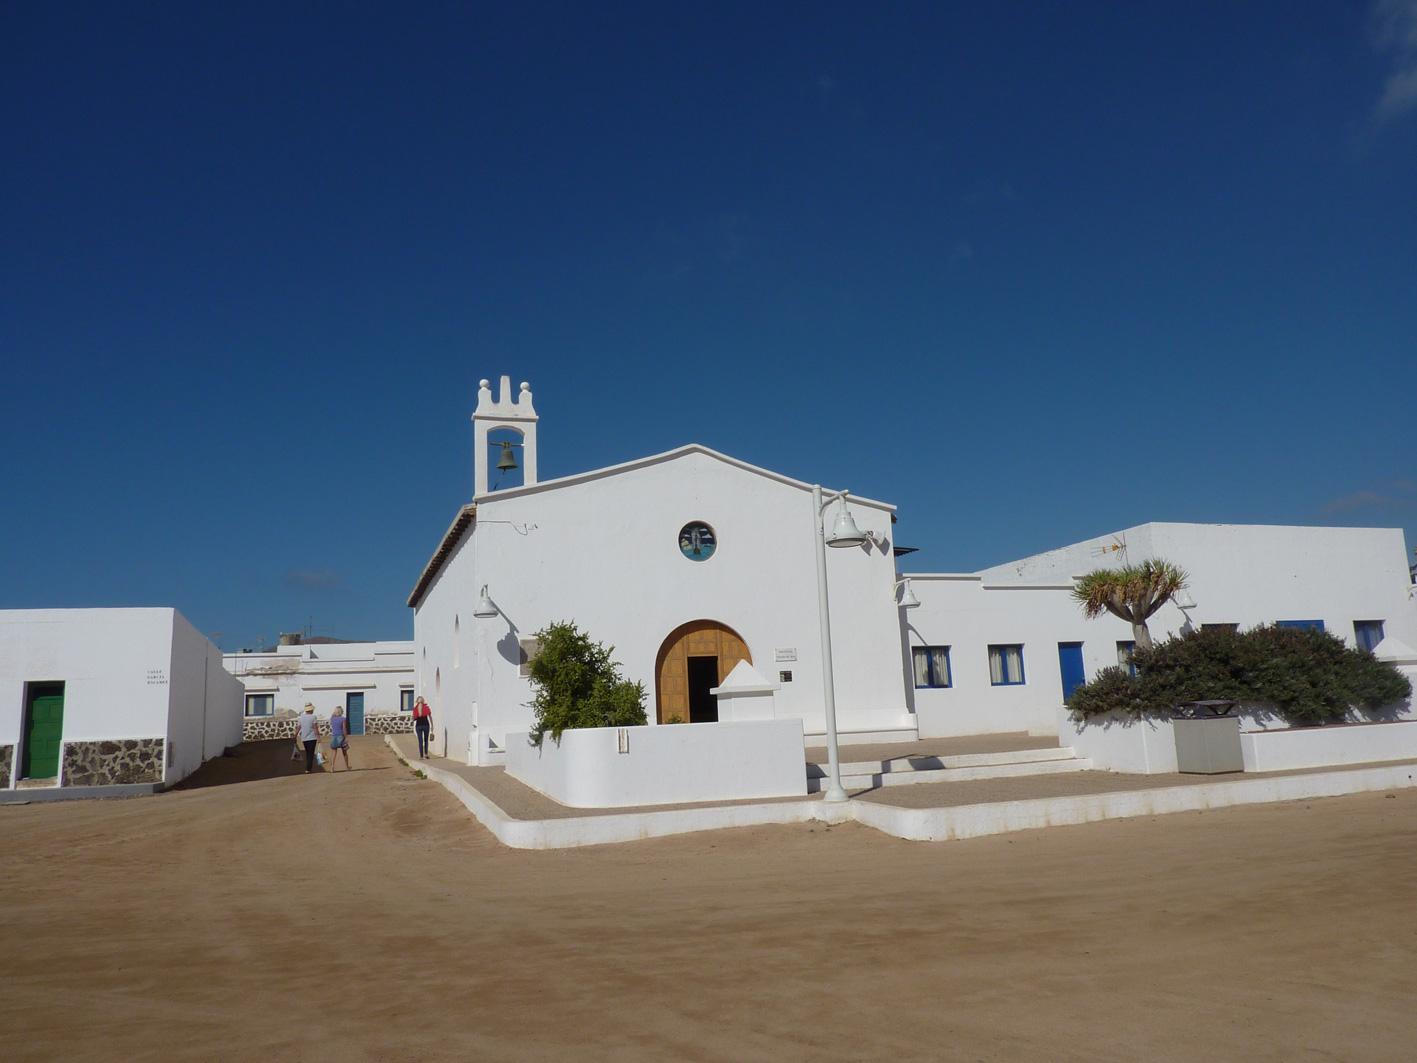 ГЛОНАСС, Канарские острова, морская часовня, остров Грасиоса